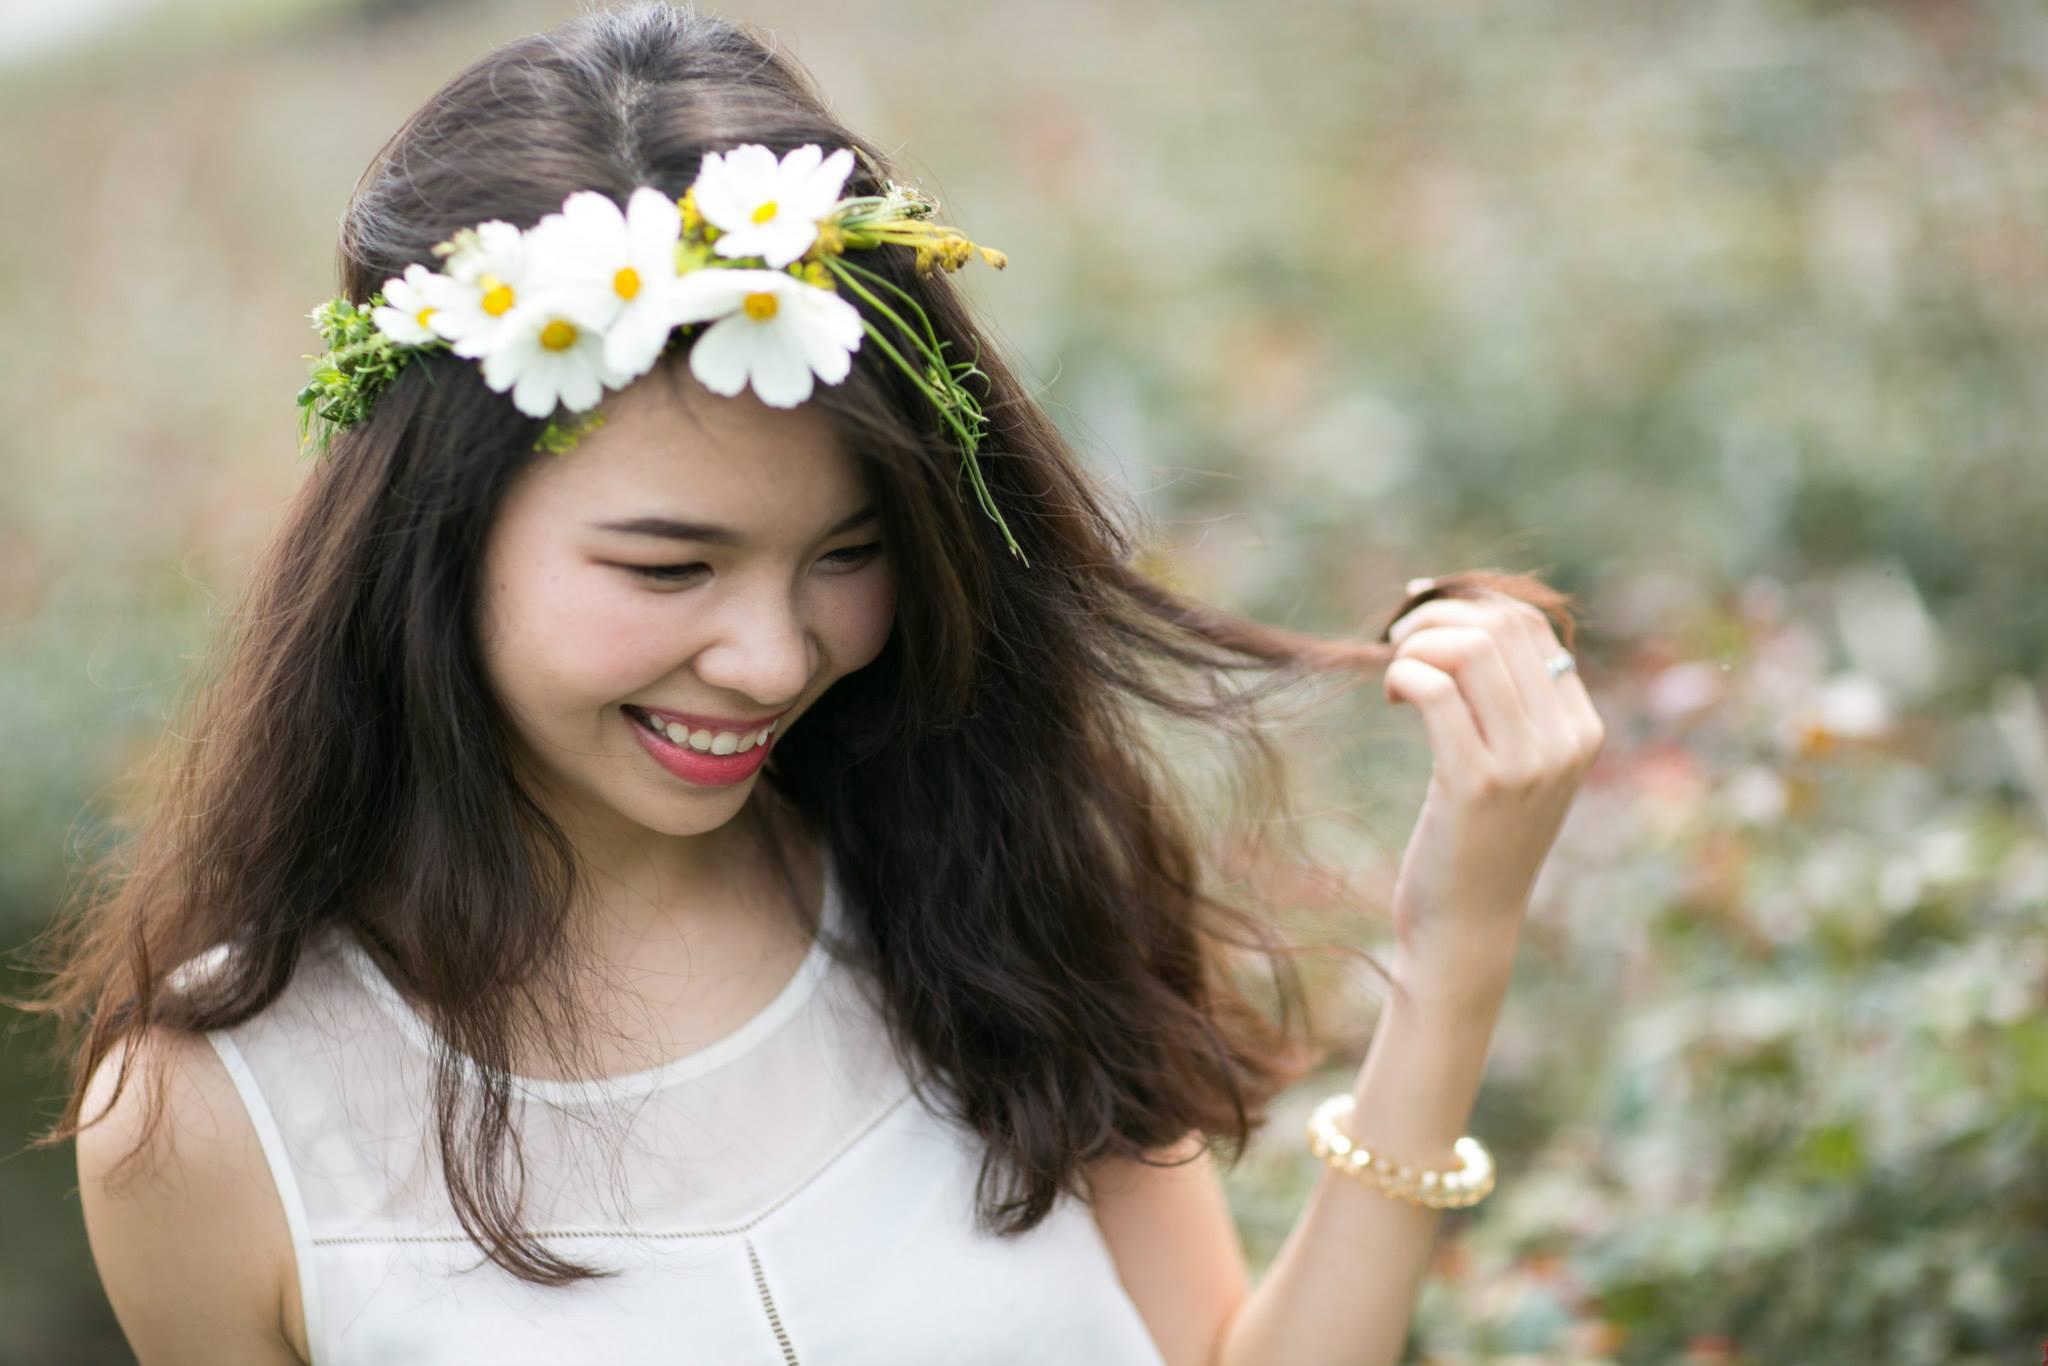 blogger lam dep chia se quy trinh cham soc da mua kho - 3